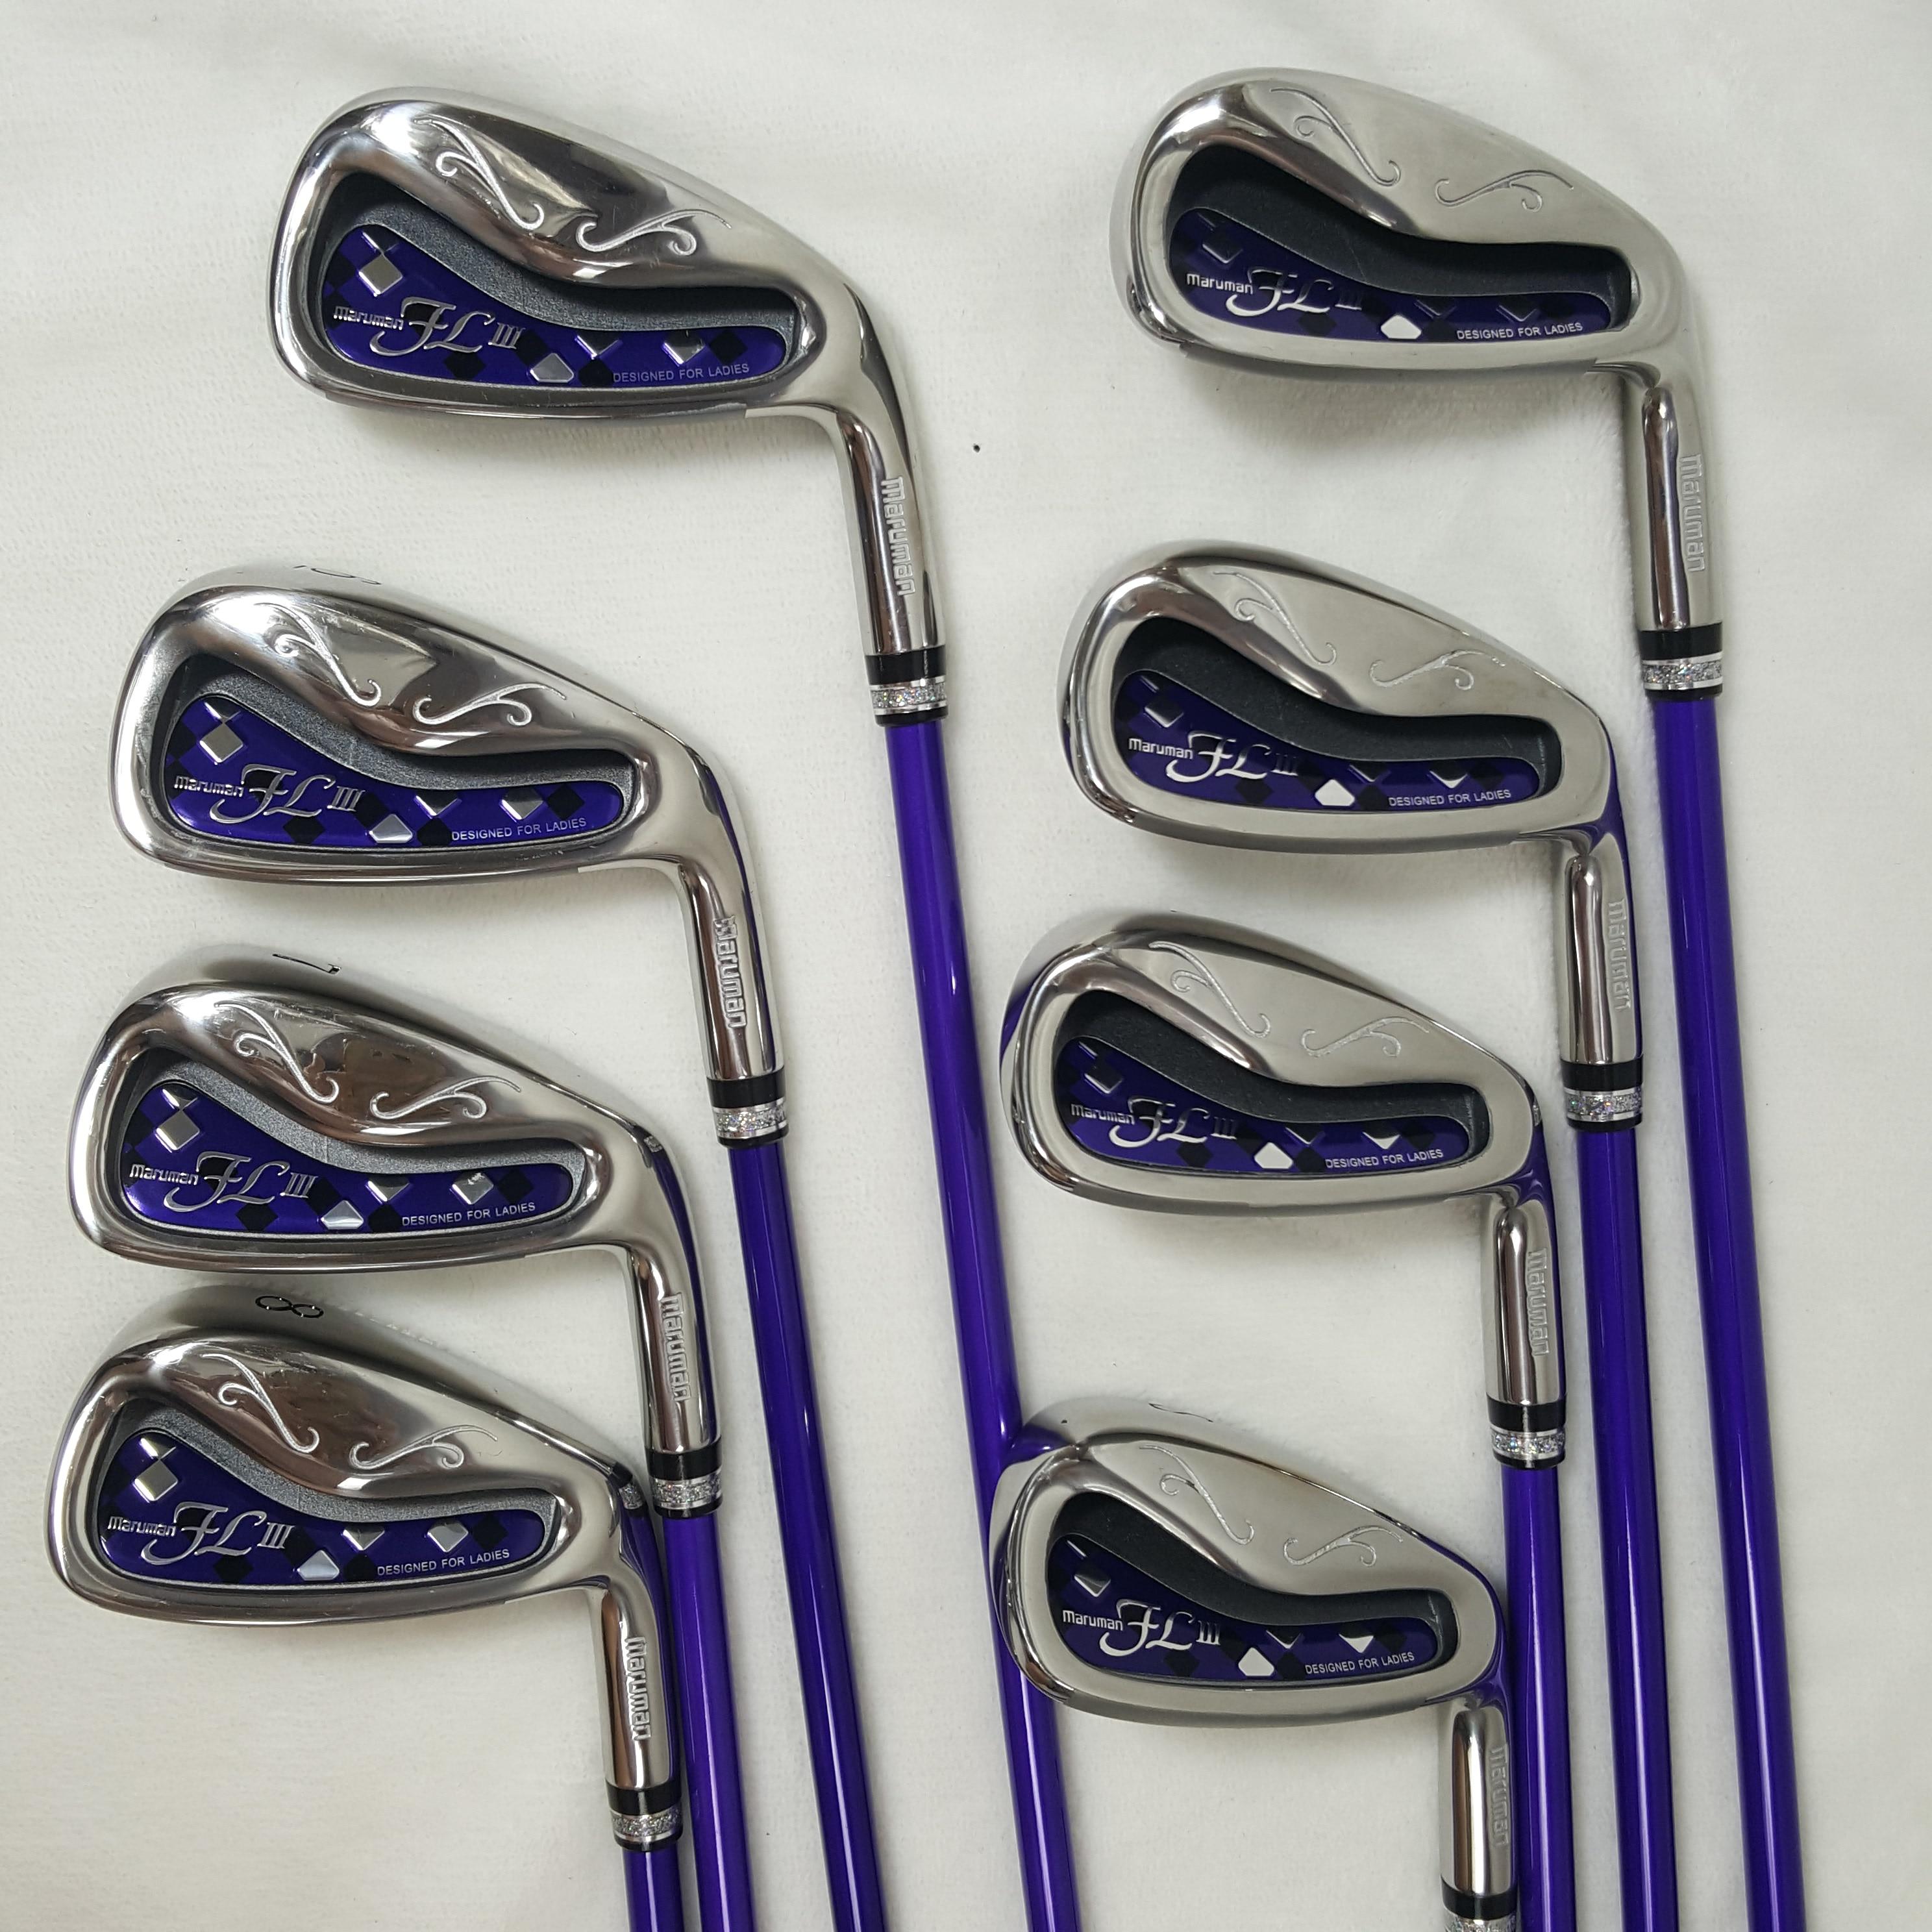 New Women's Golf Club Maruman FL III Brand New Exquisite Golf Iron Set Graphite L Flex Free Shipping